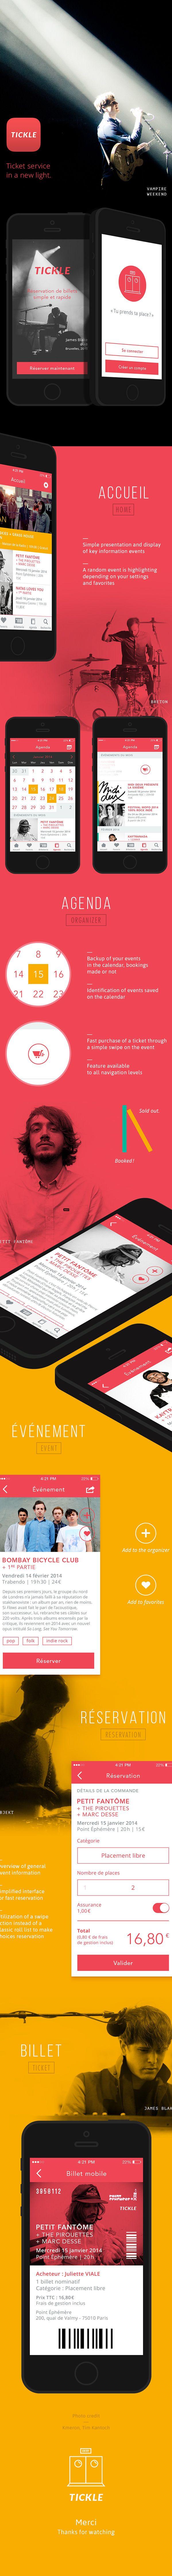 Tickle - Concept Mobile app by Caroline Varina Sourivong, via Behance